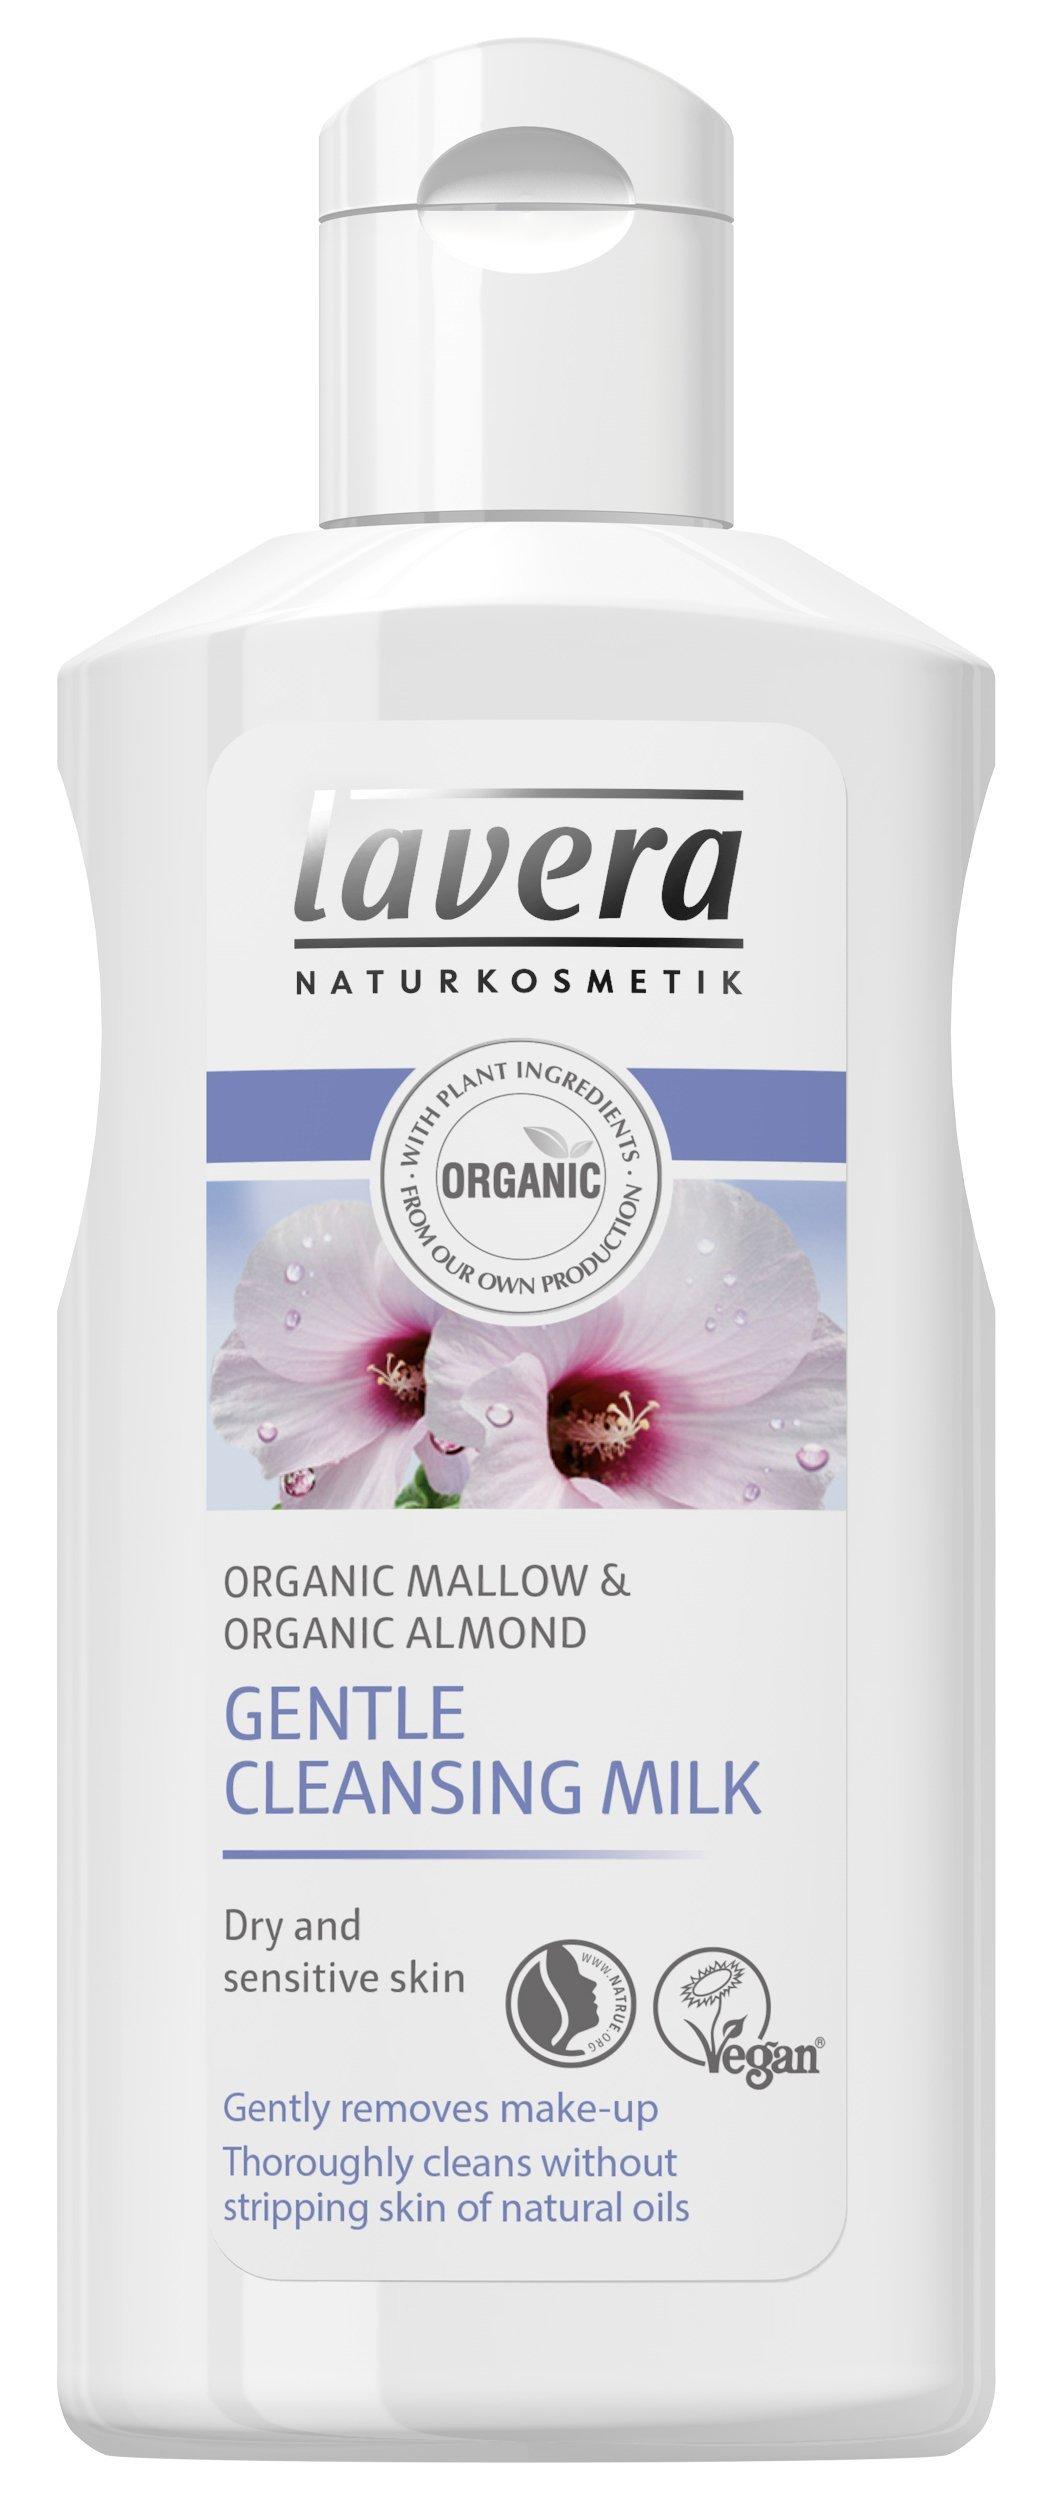 Lavera Gentle Cleansing Milk (For Dry & Sensitive Skin) 125ml